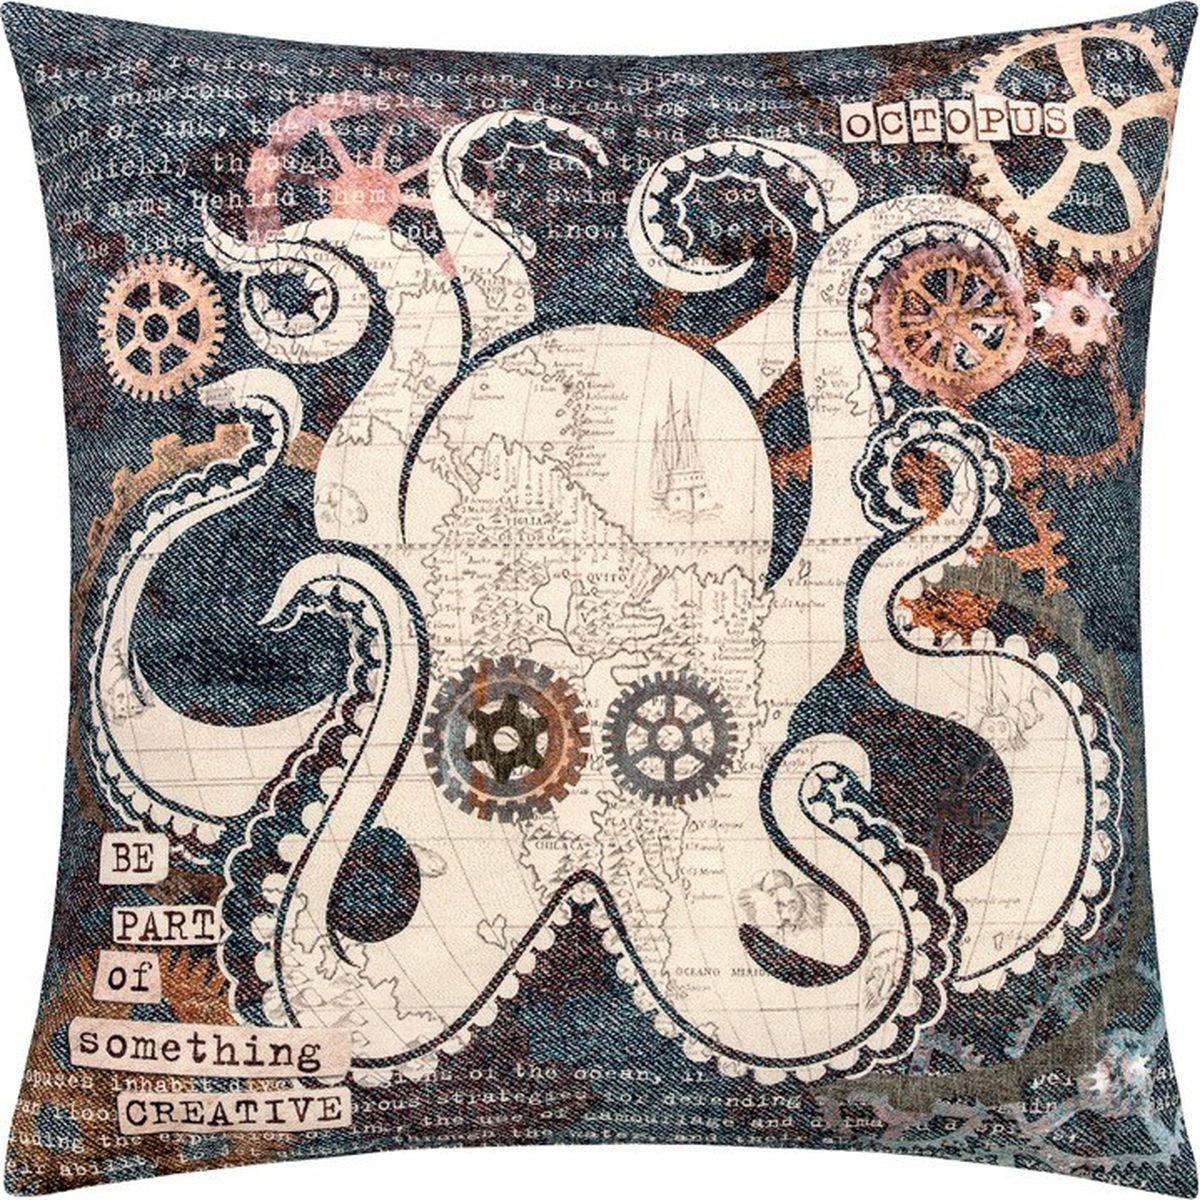 Подушка декоративная Togas Осьминог, 45 х 45 см40.16.70.0275